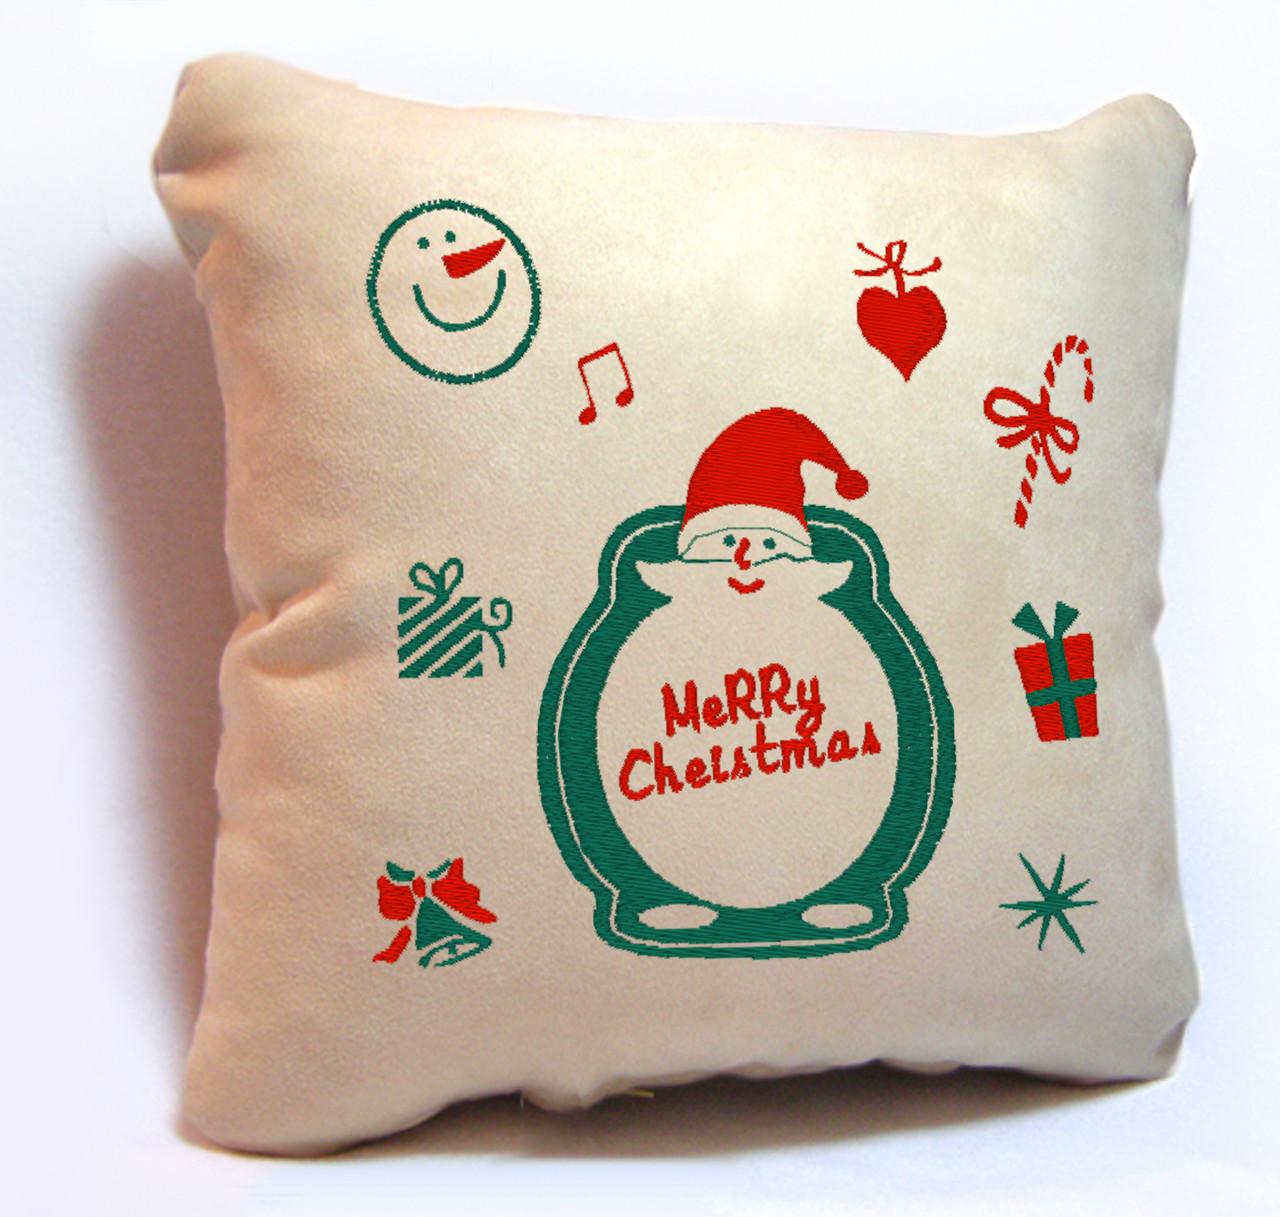 "Новогодняя подушка Slivki ""Merry Christmas"" 27, цвет бежевый 30х30см"